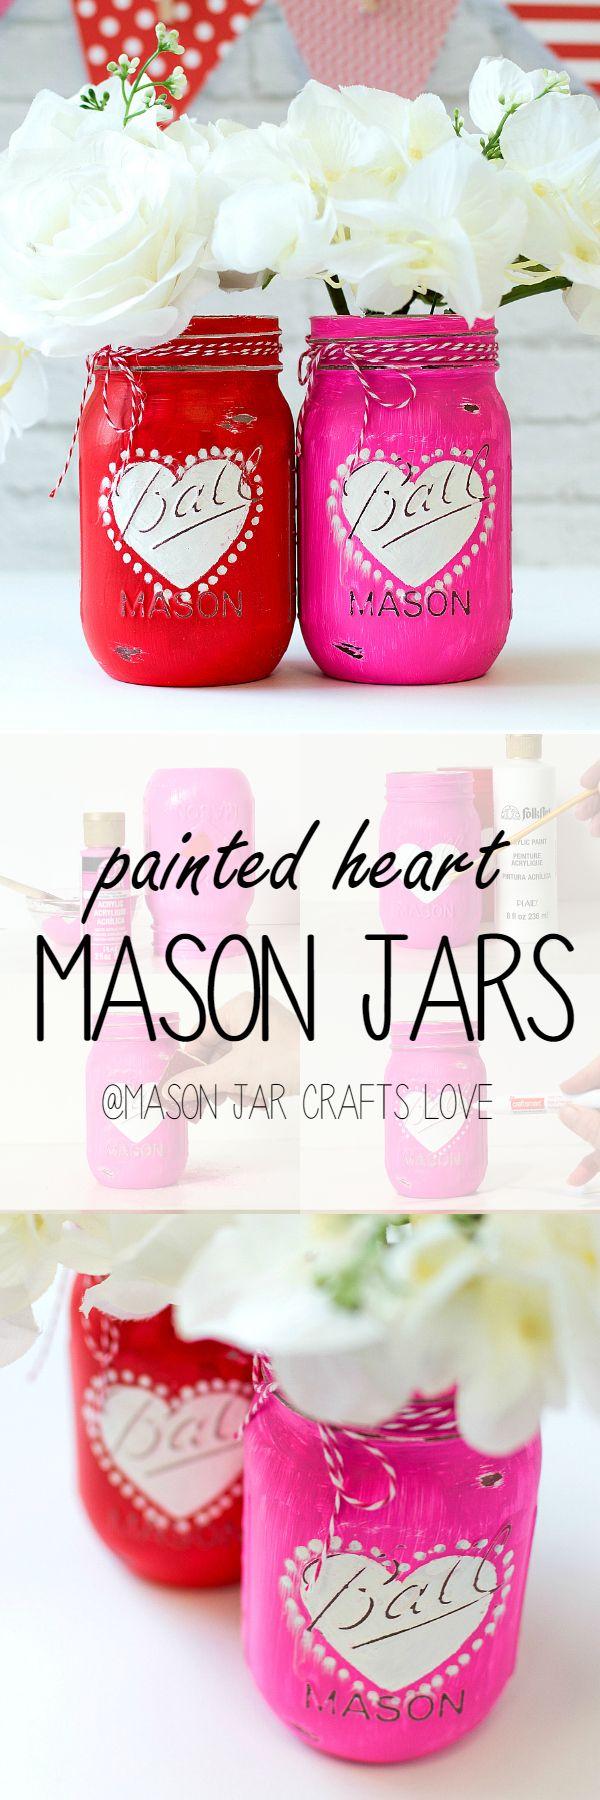 DIY Mason Jar Crafts for Valentine Day - Heart Jar Craft